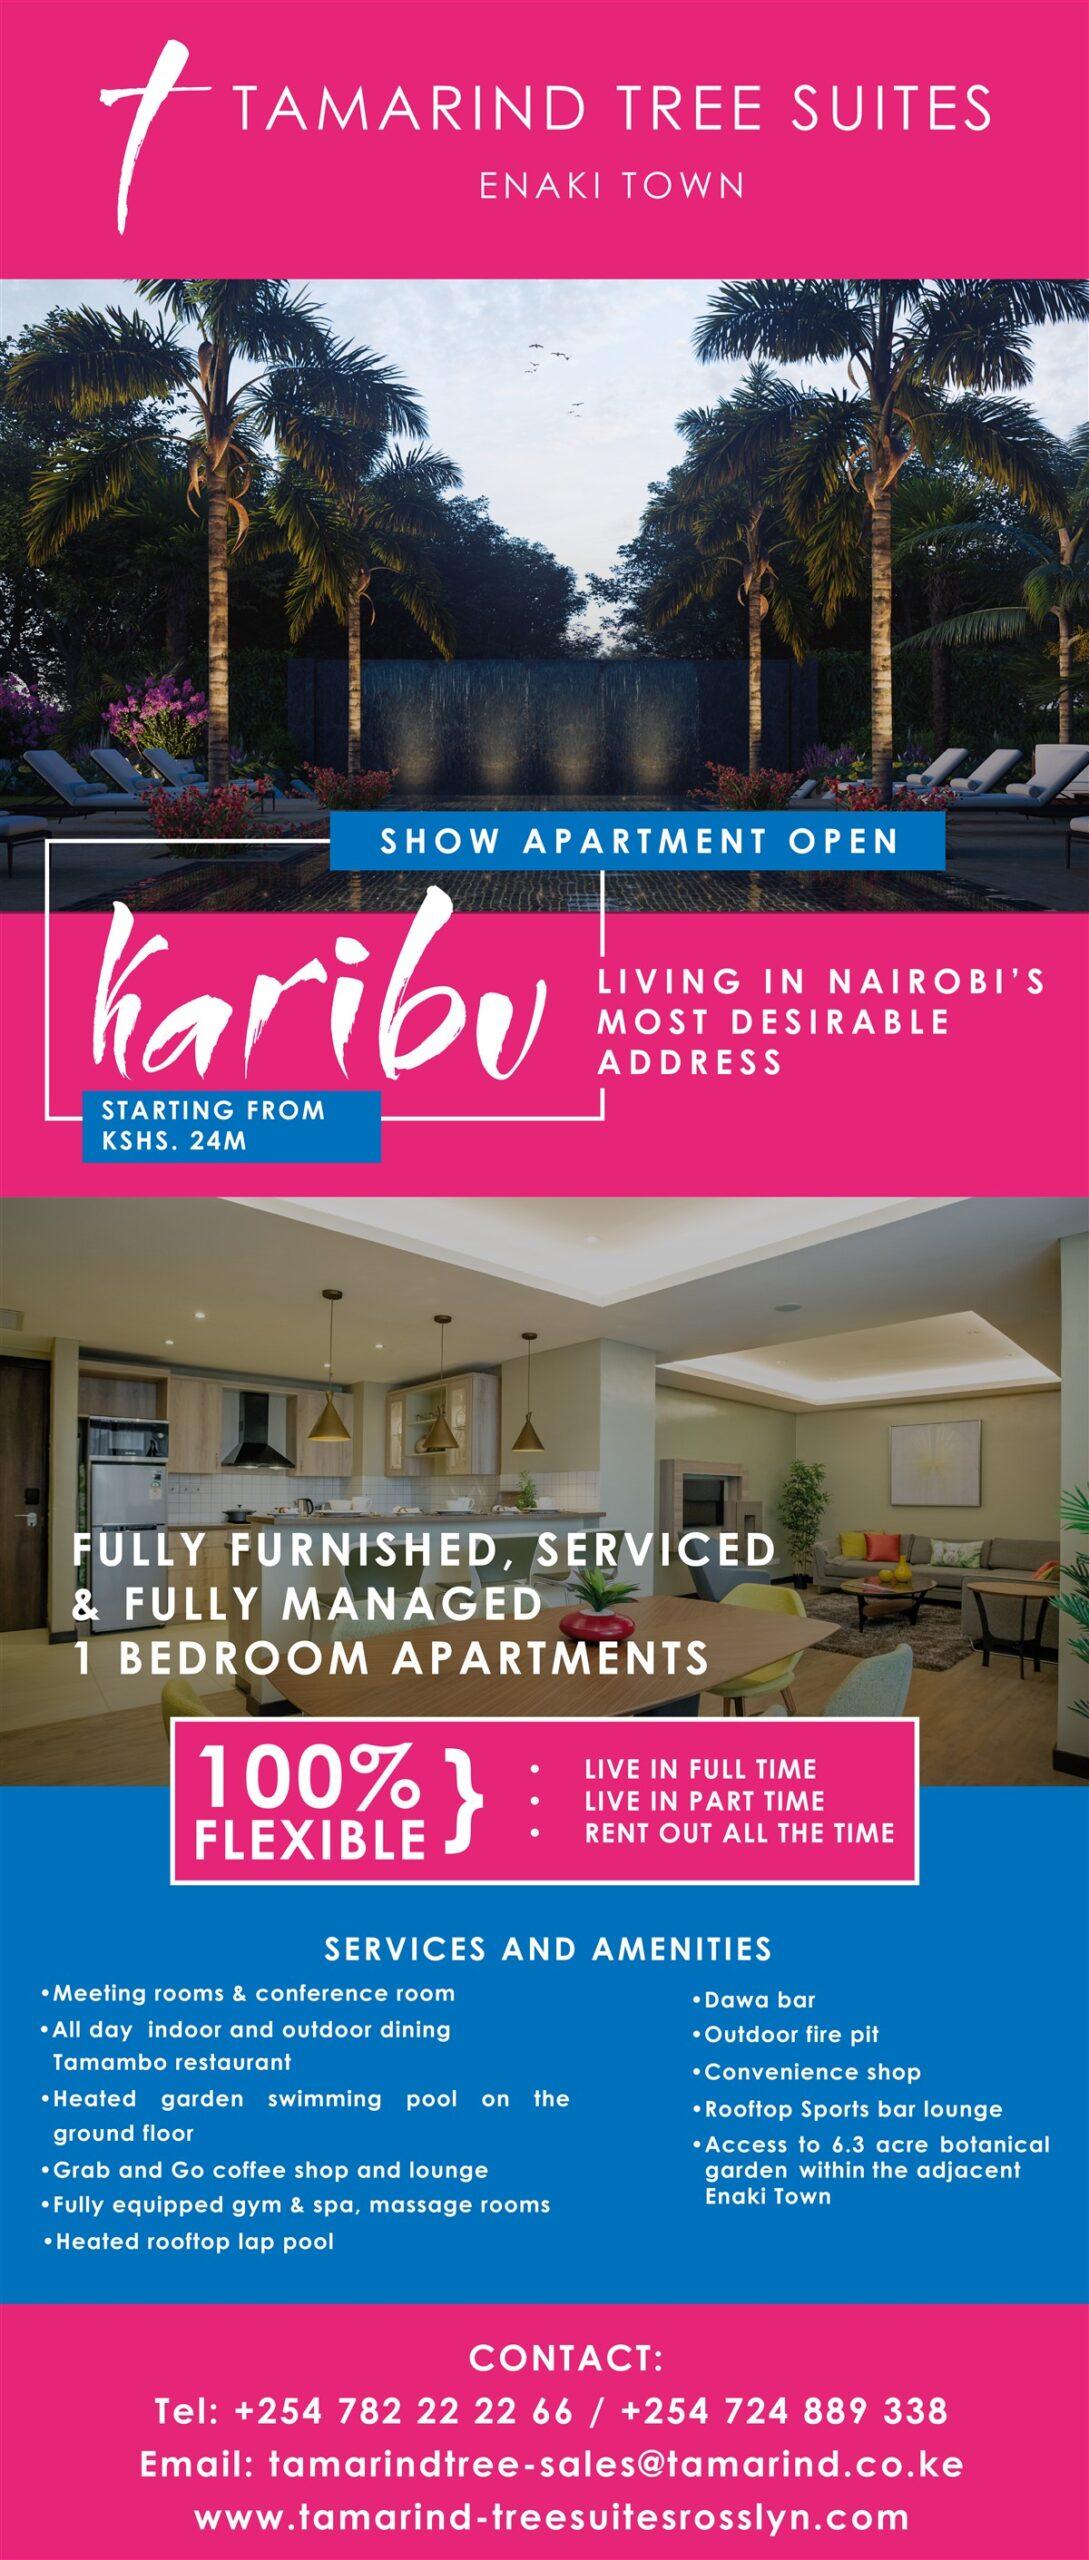 Tamarind Tree Suites Enaki Town- Living In Nairobi's Most Desirable Address- Starting From KSHS. 24M